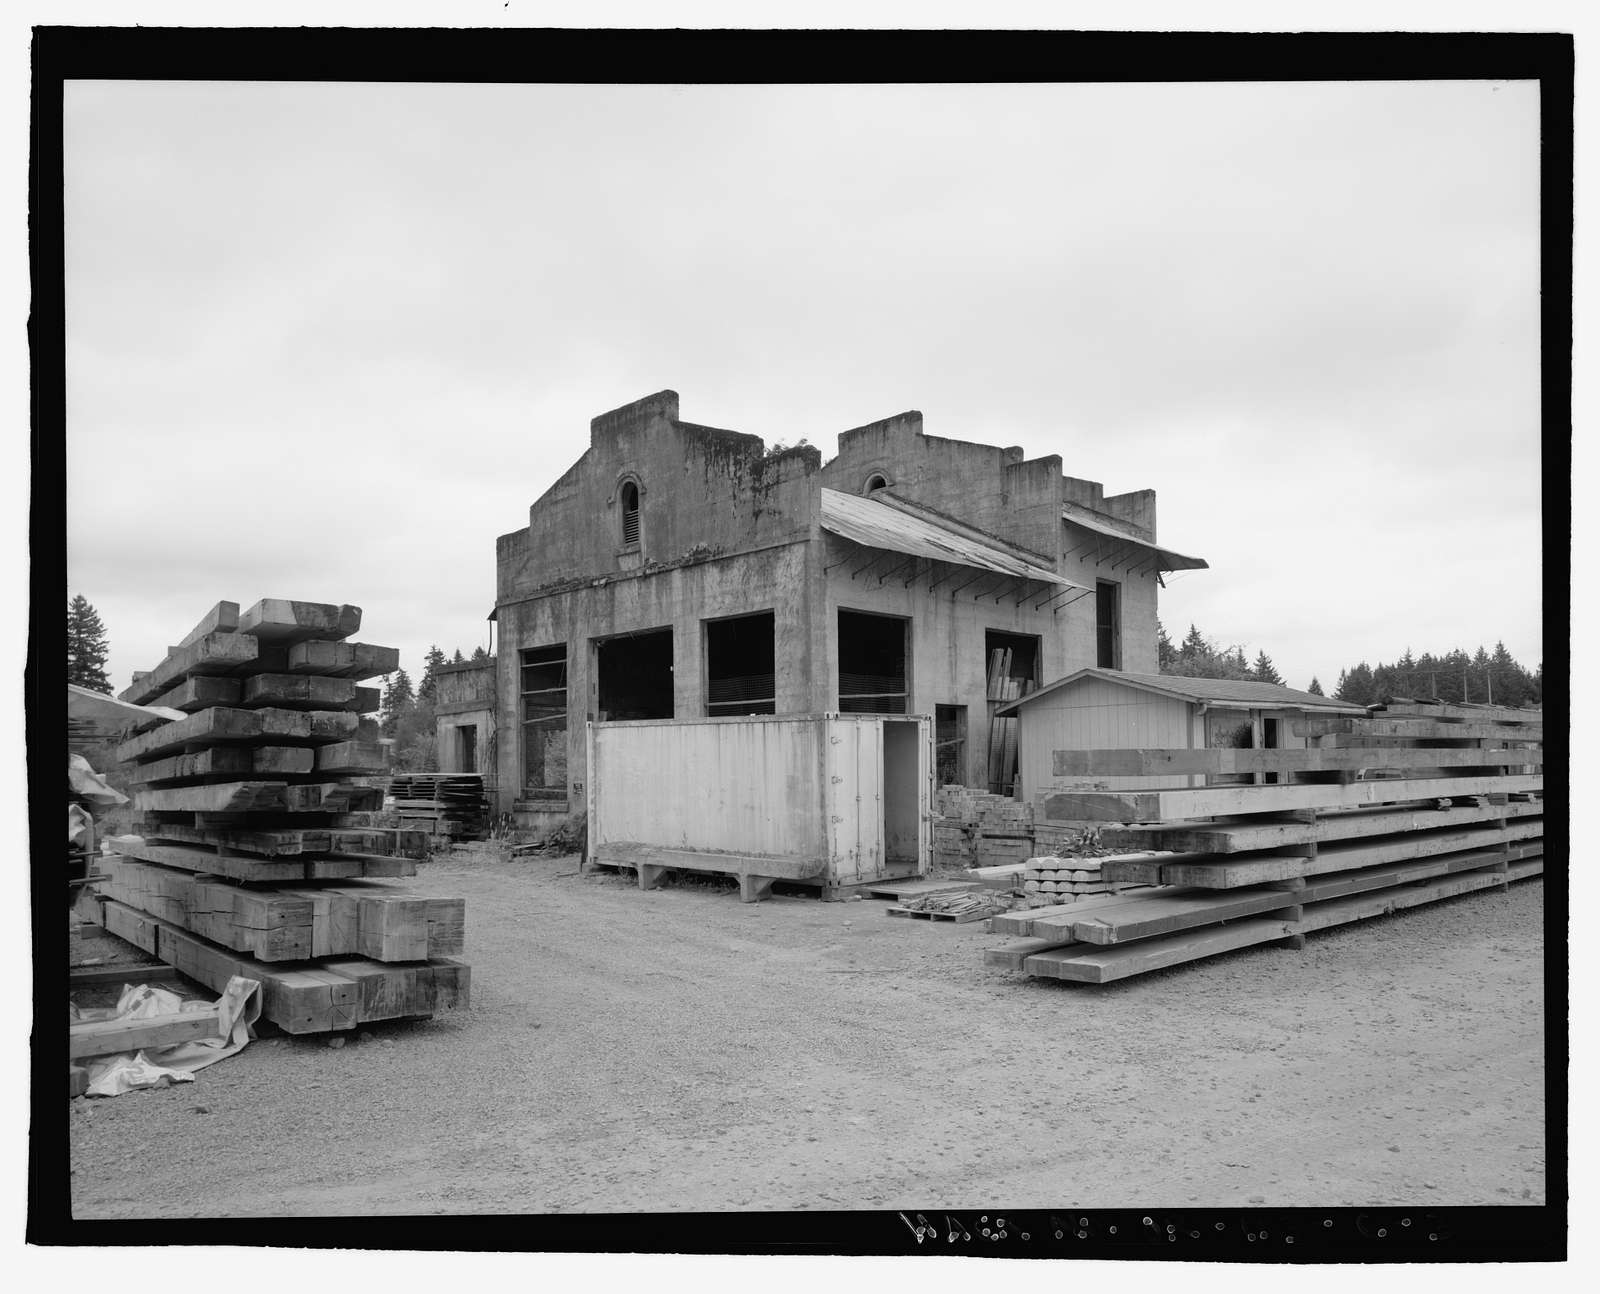 Oregon Electric Railroad, Tonquin Substation, Garden Home to Wilsonville Segment, Milepost 39.1, Wilsonville, Clackamas County, OR